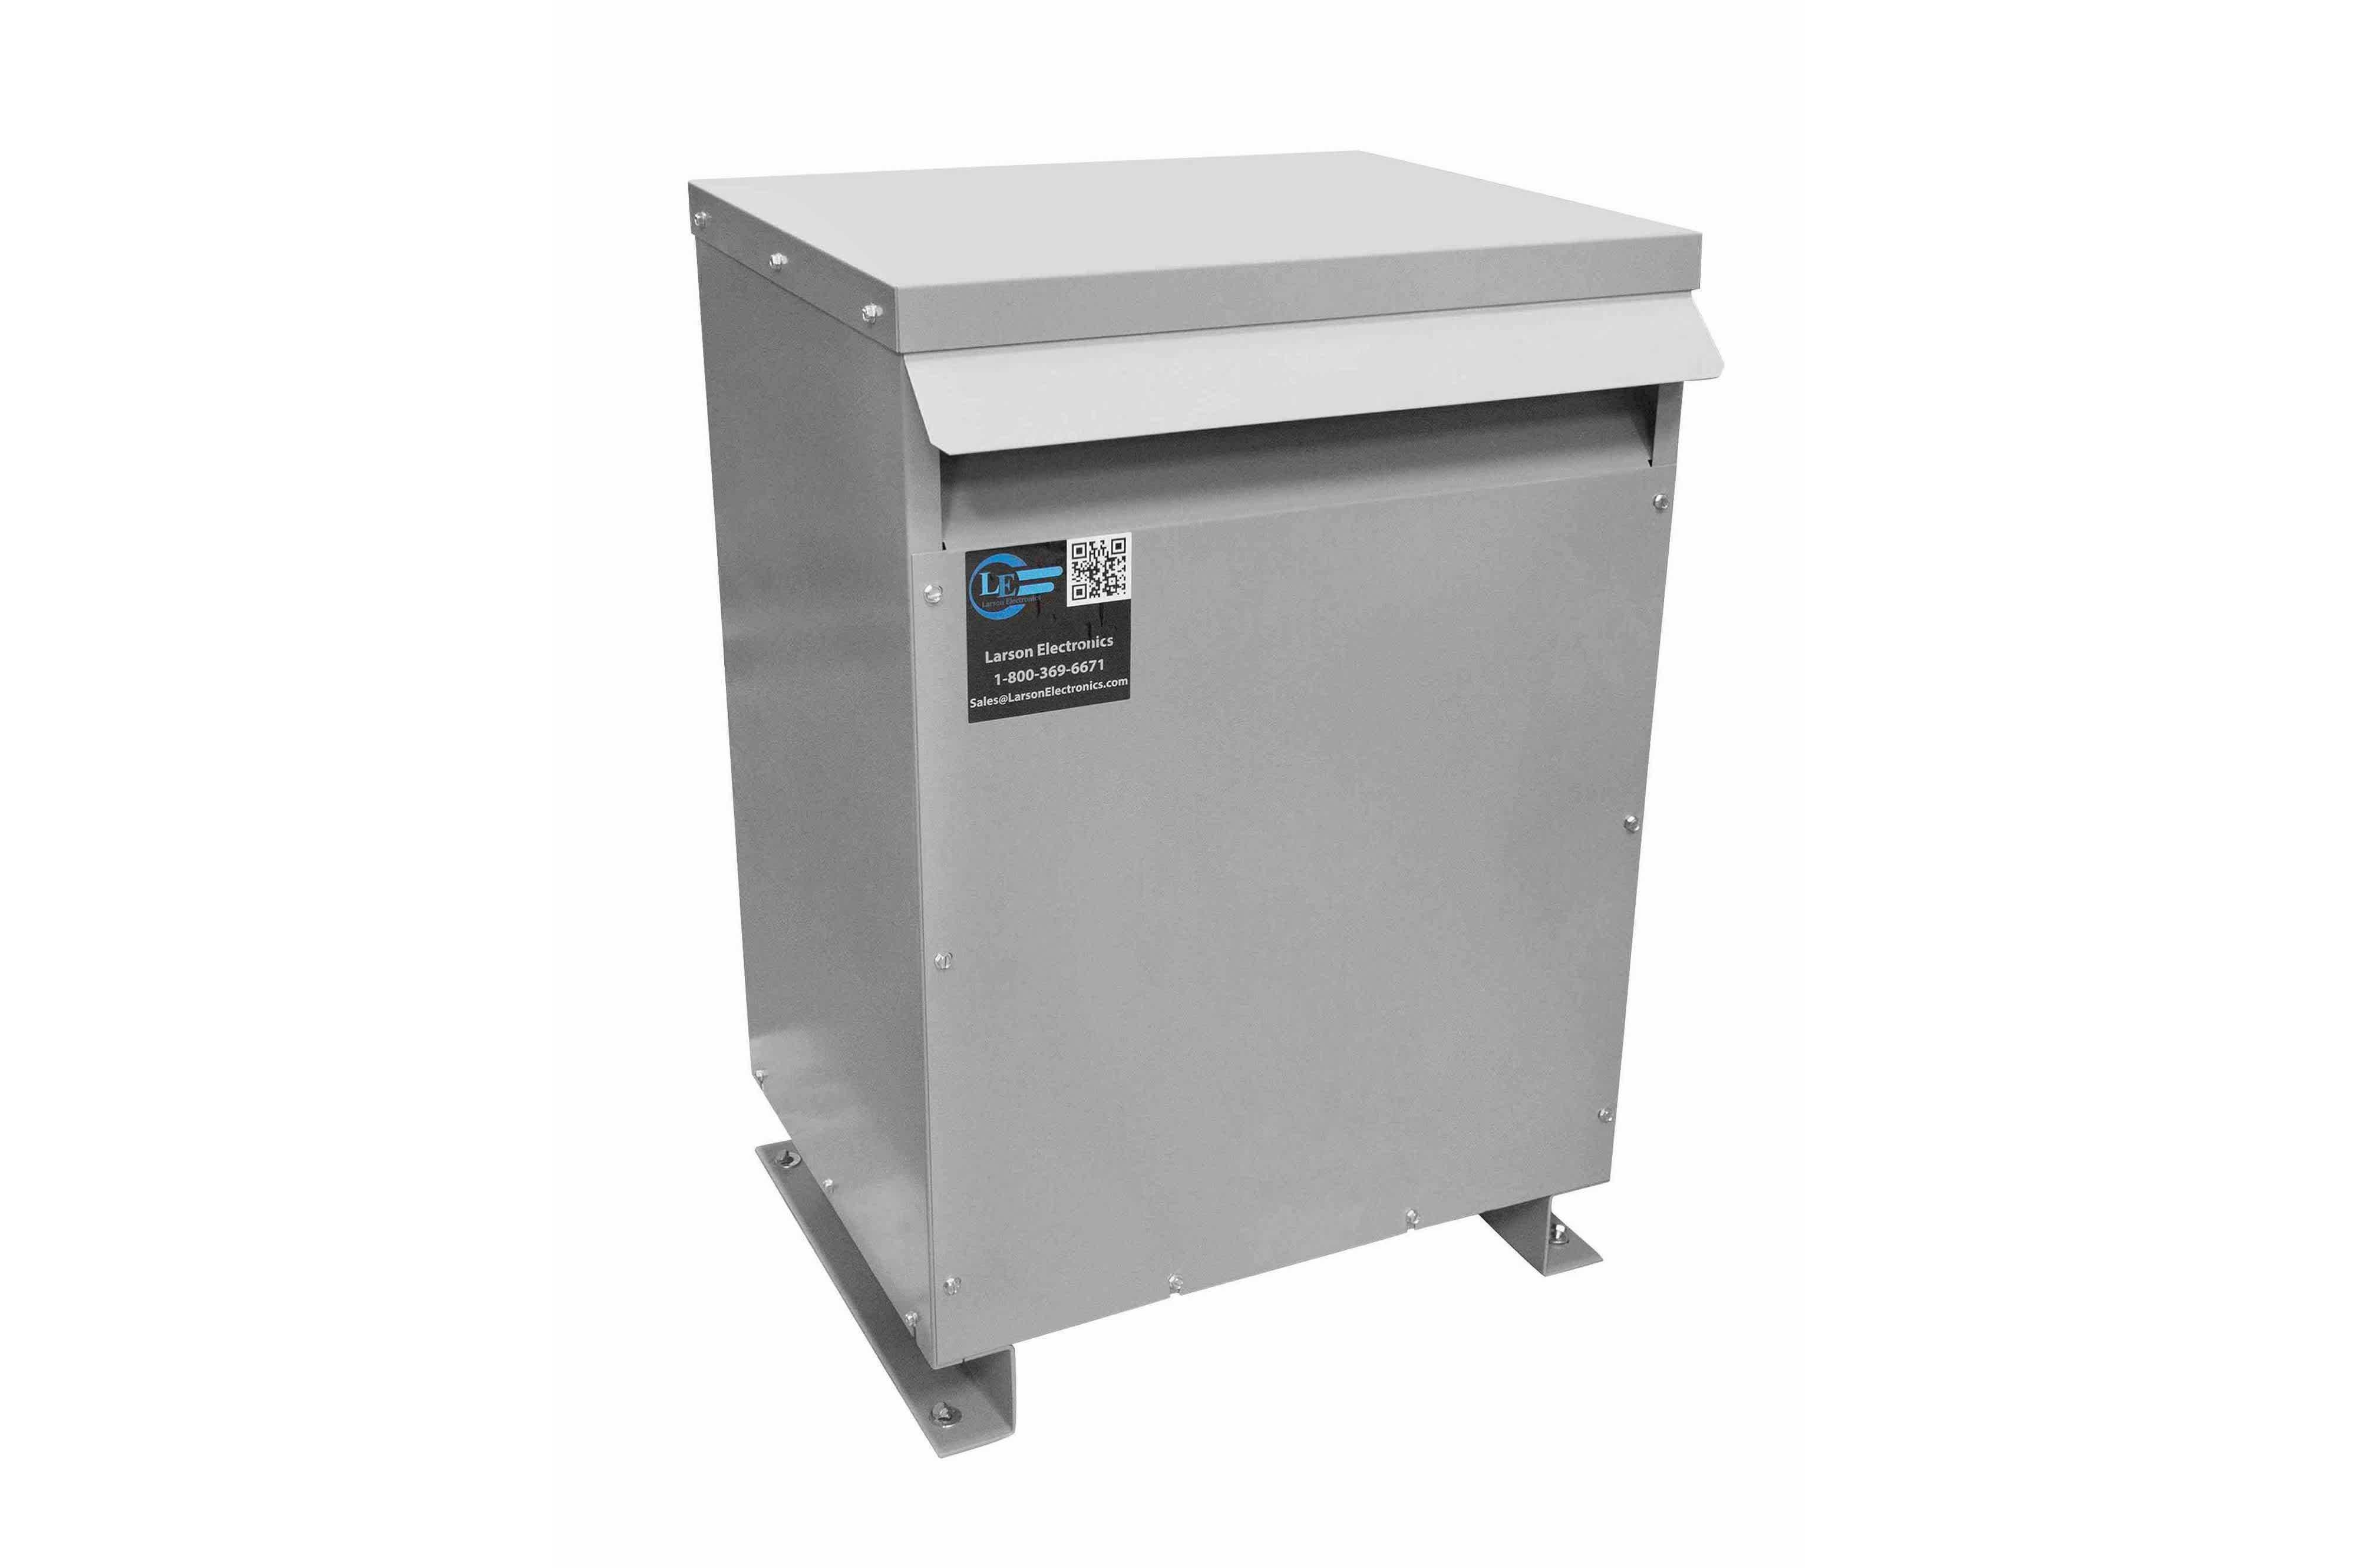 52.5 kVA 3PH Isolation Transformer, 380V Wye Primary, 240V Delta Secondary, N3R, Ventilated, 60 Hz